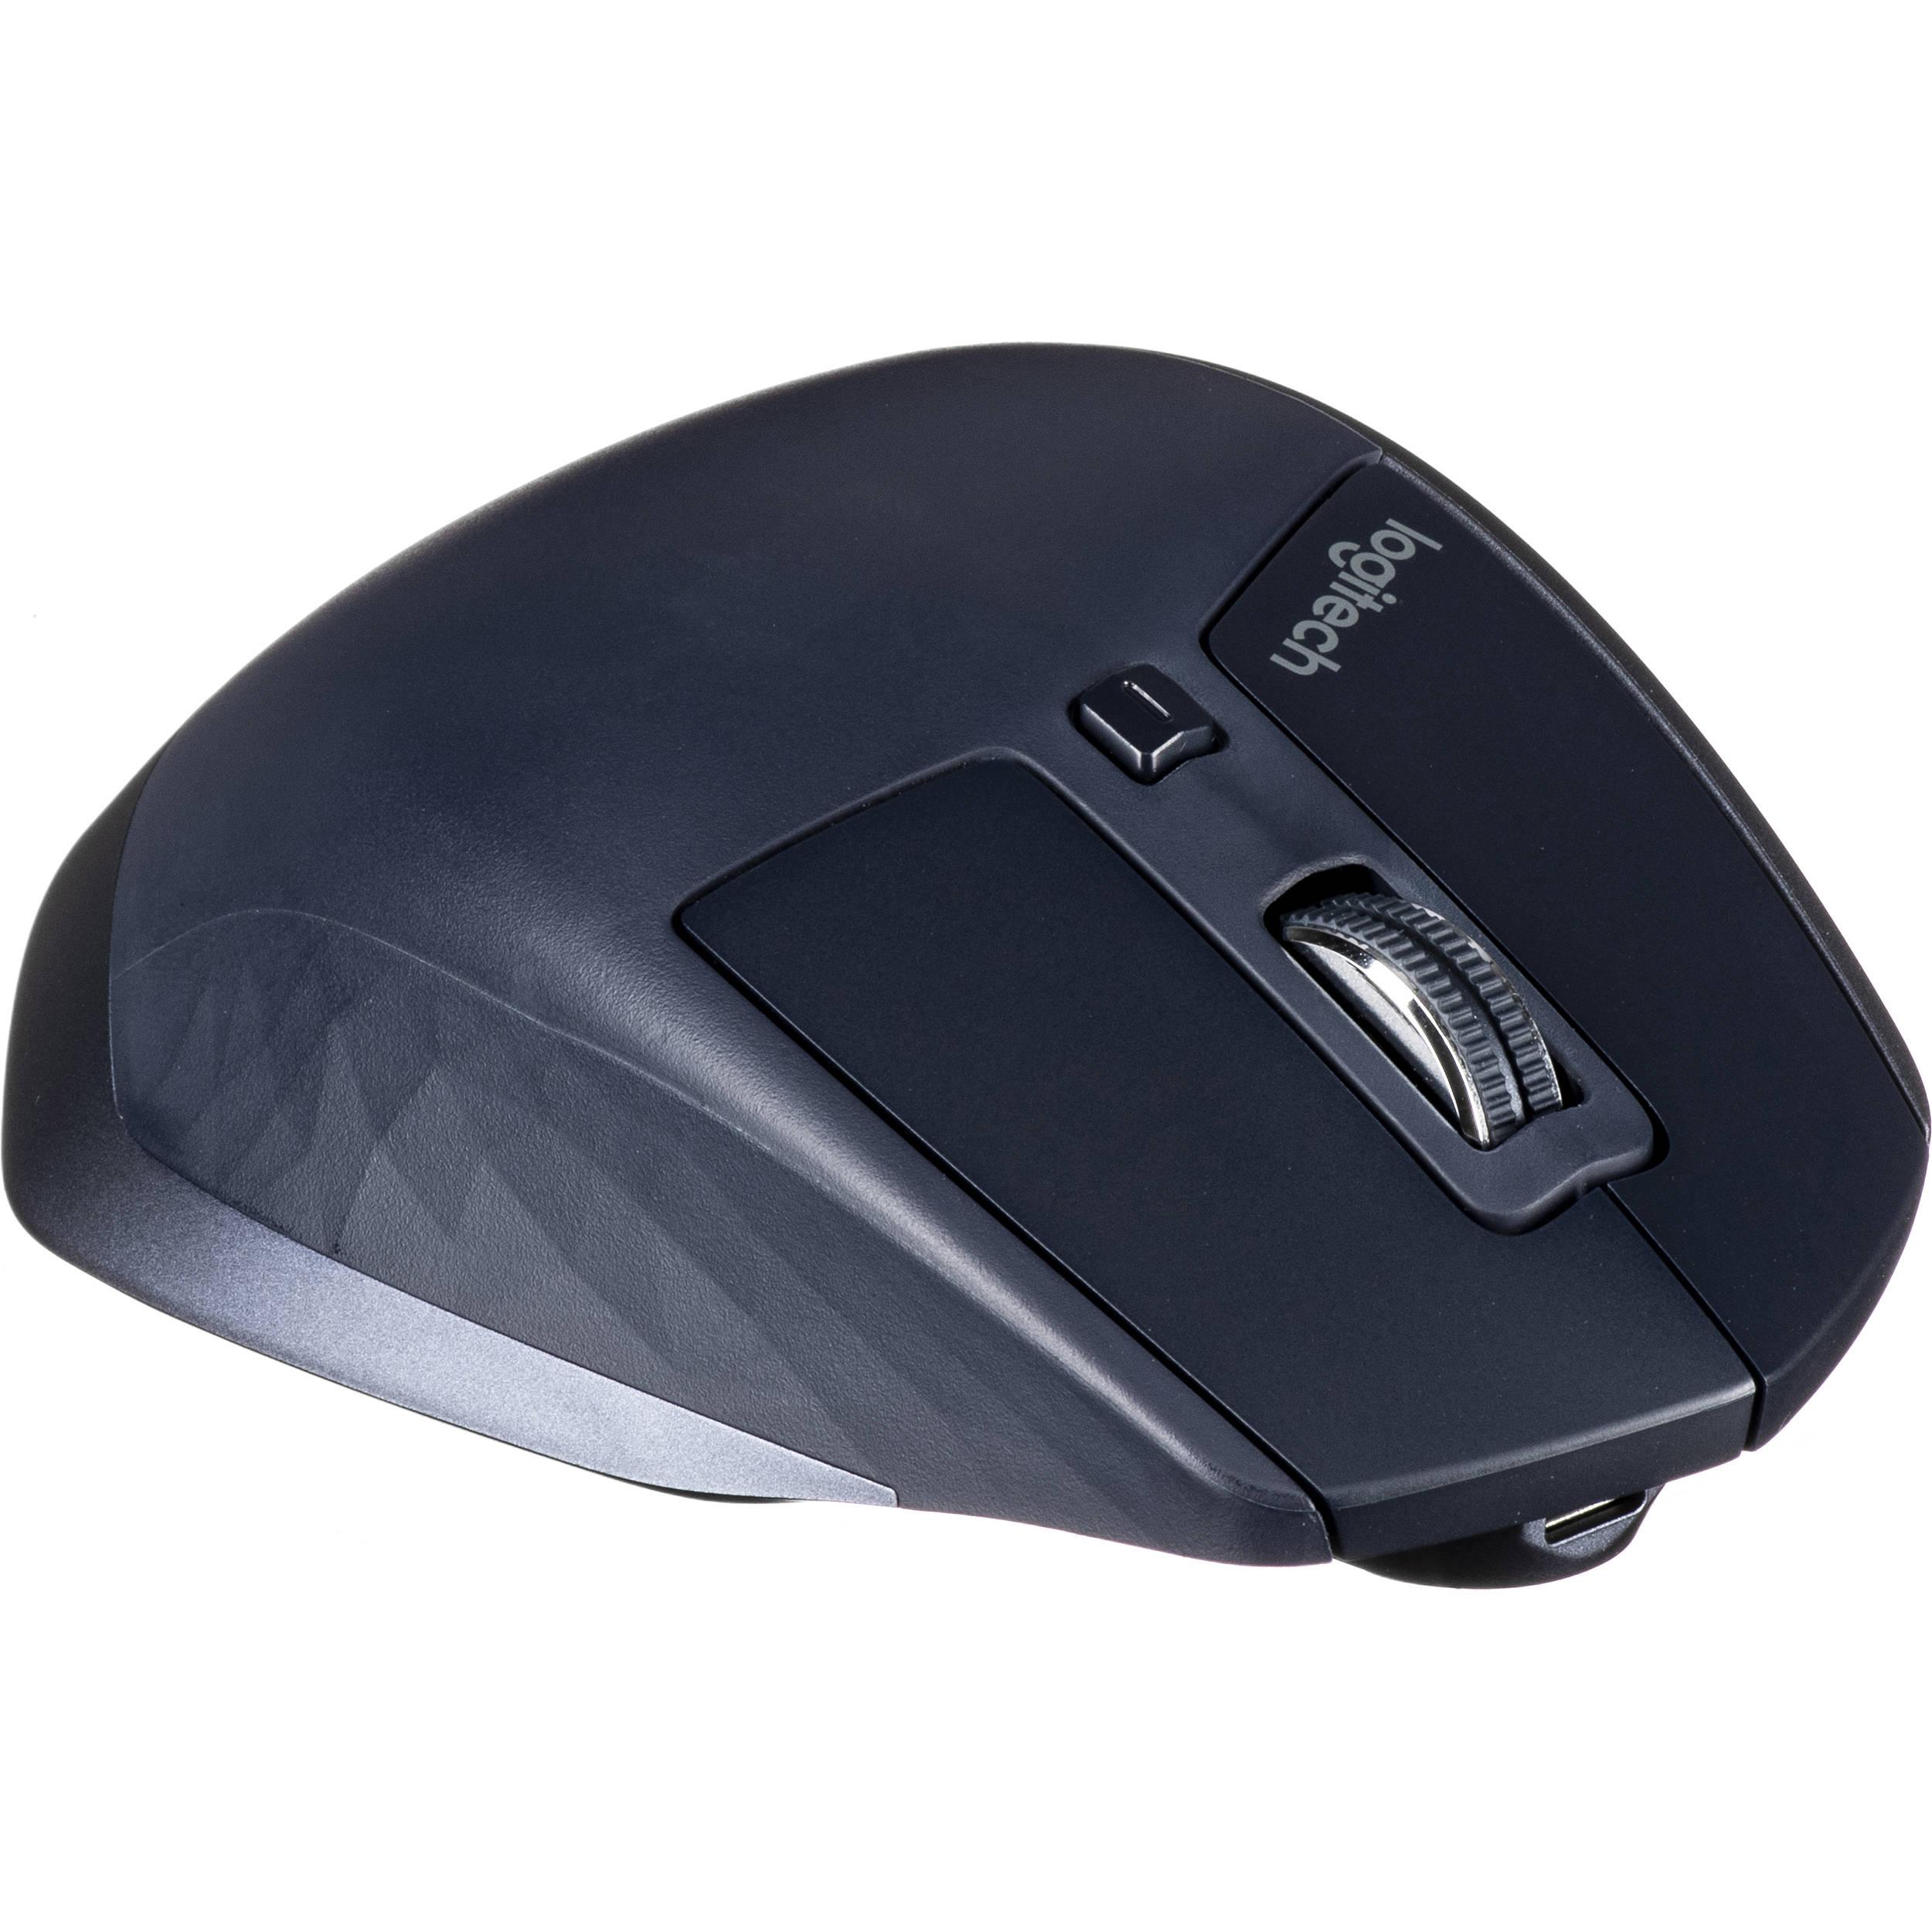 eeb8fcb9d81 Logitech MX Master Wireless Mouse (Navy Blue) 910-004955 B&H